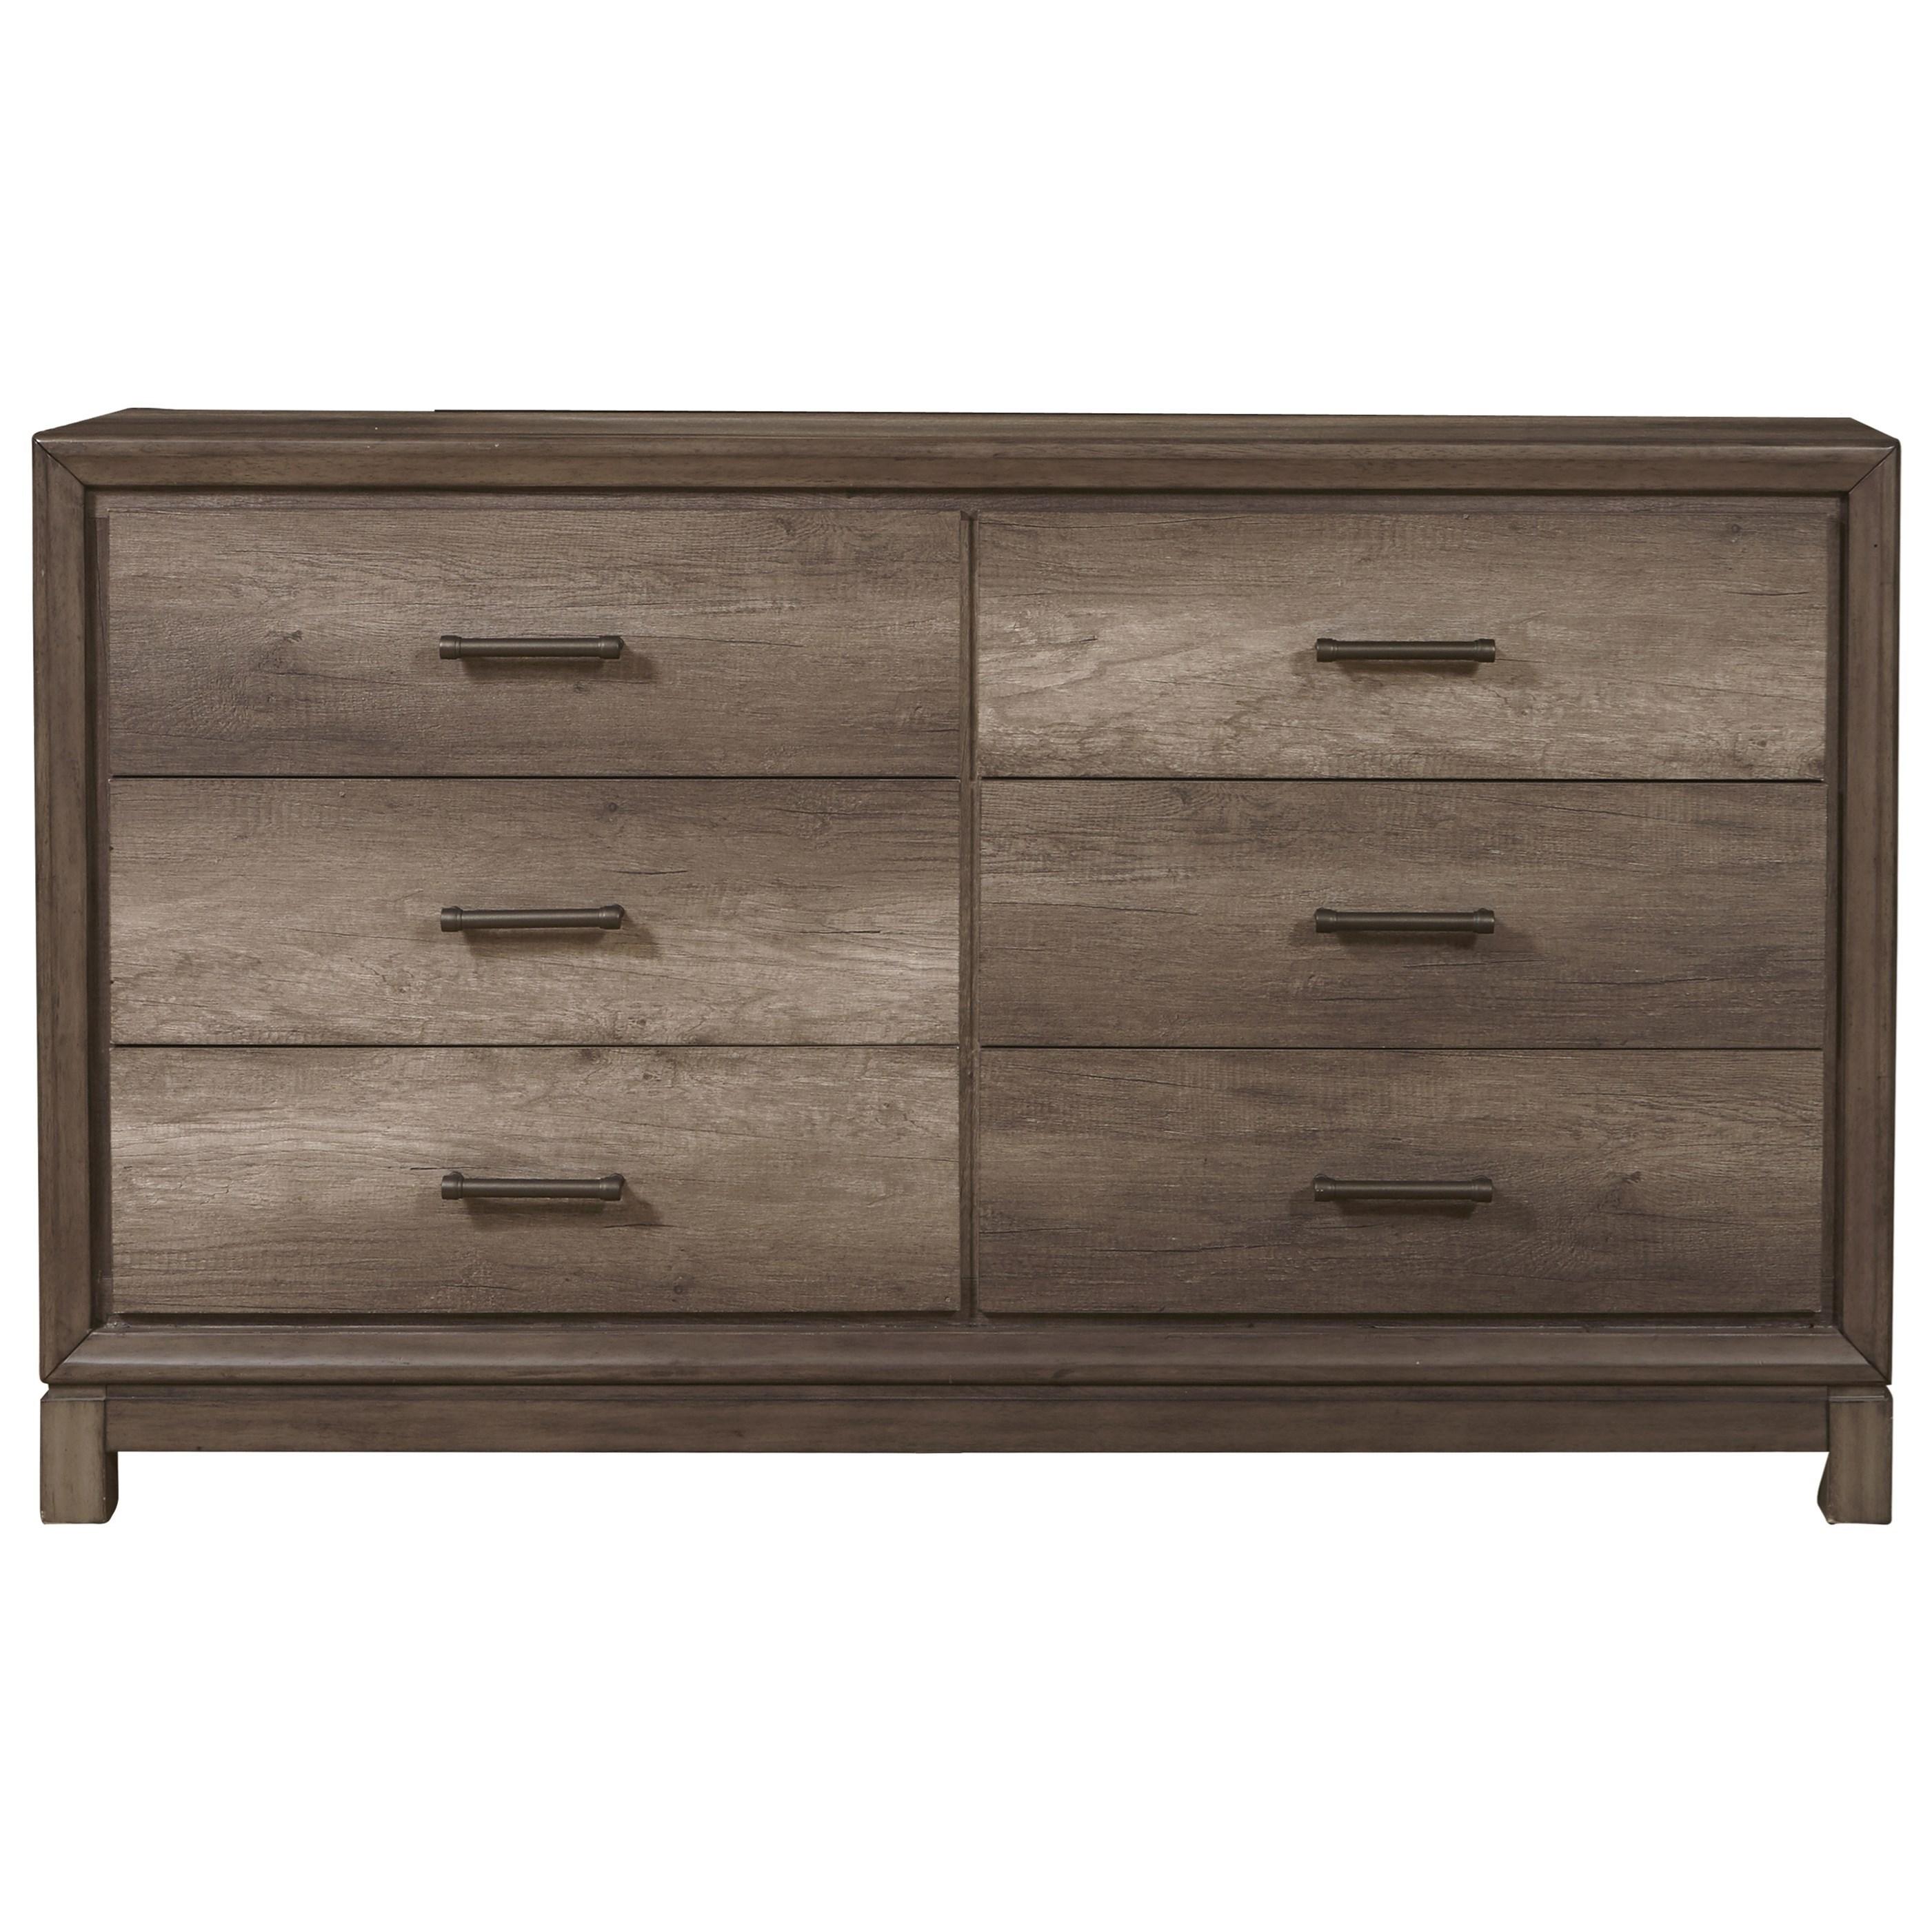 Evans Dresser